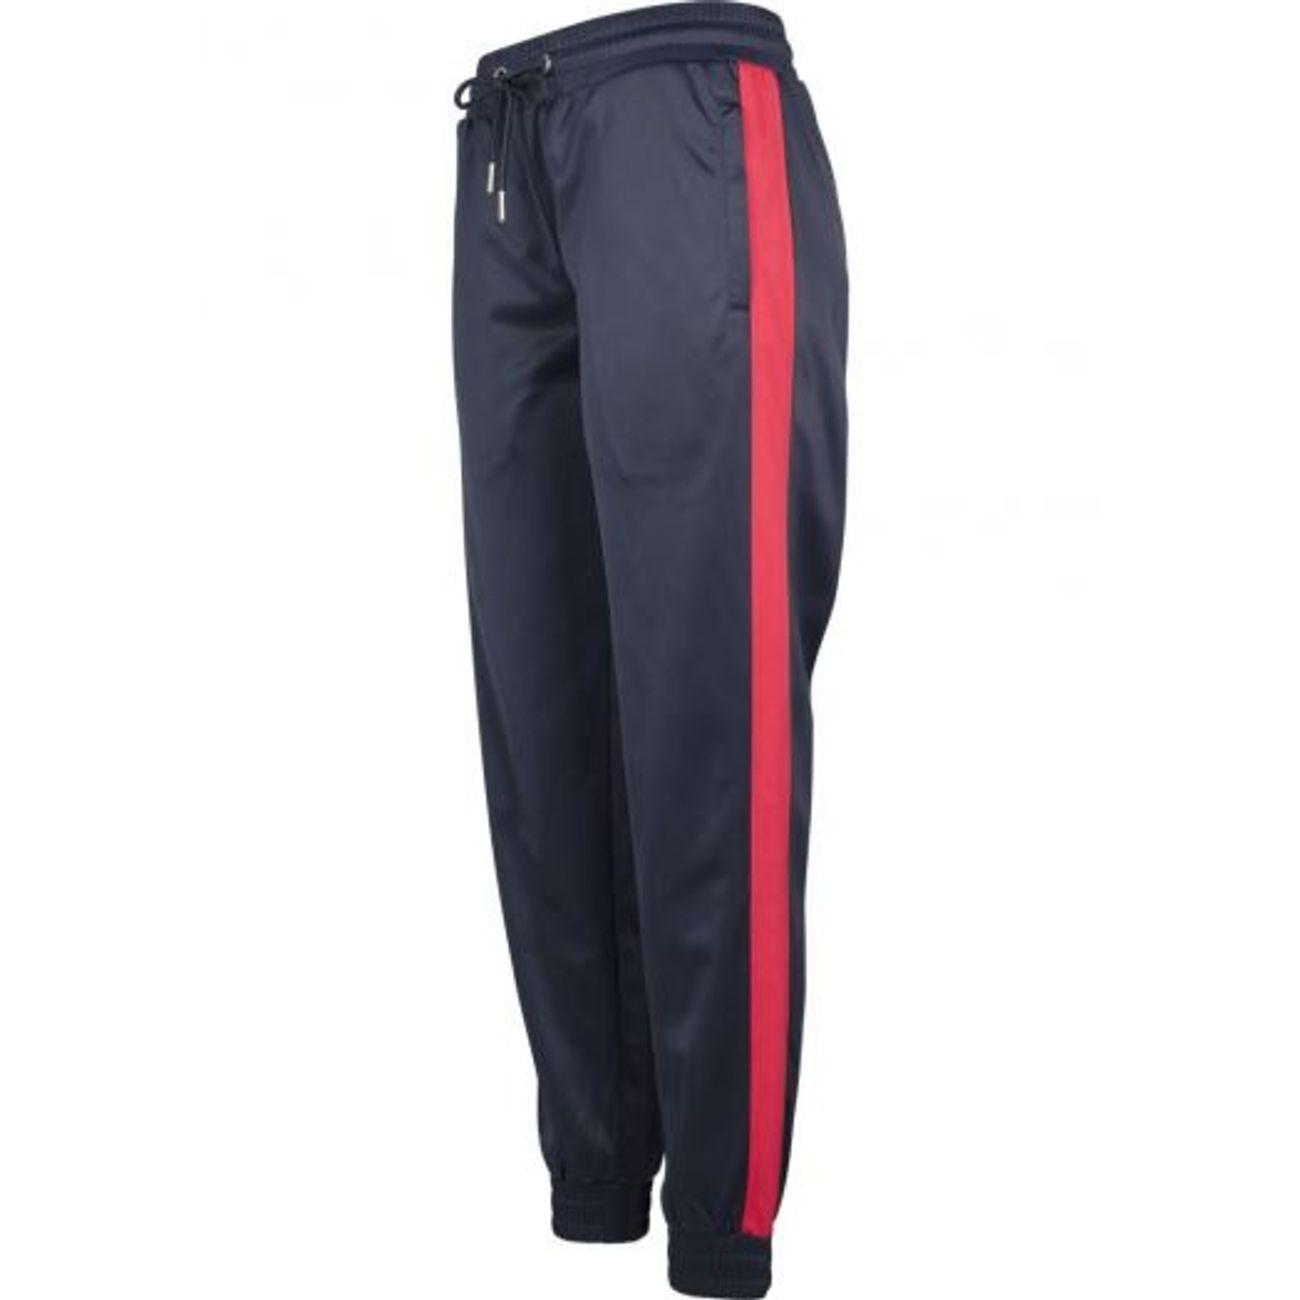 40cd676d692a Mode- Lifestyle femme URBAN CLASSICS Bas de Jogging Urban Classics Femme  Bleu Marine Bandes Rouge ...